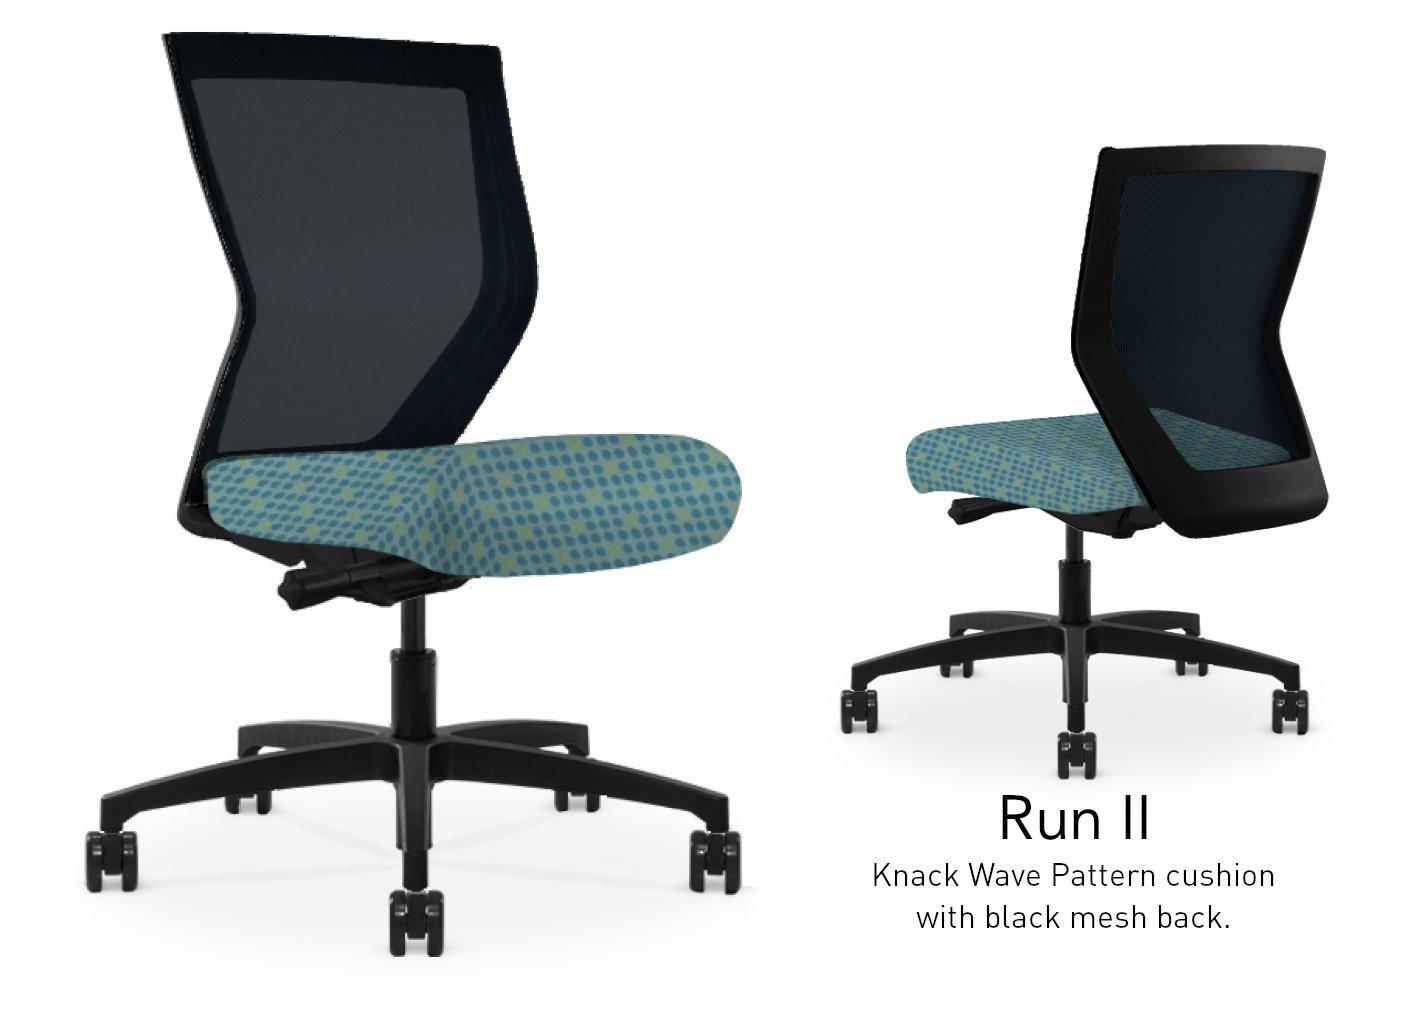 Run II High Back Black Frame Office Chair with Black Mesh Back